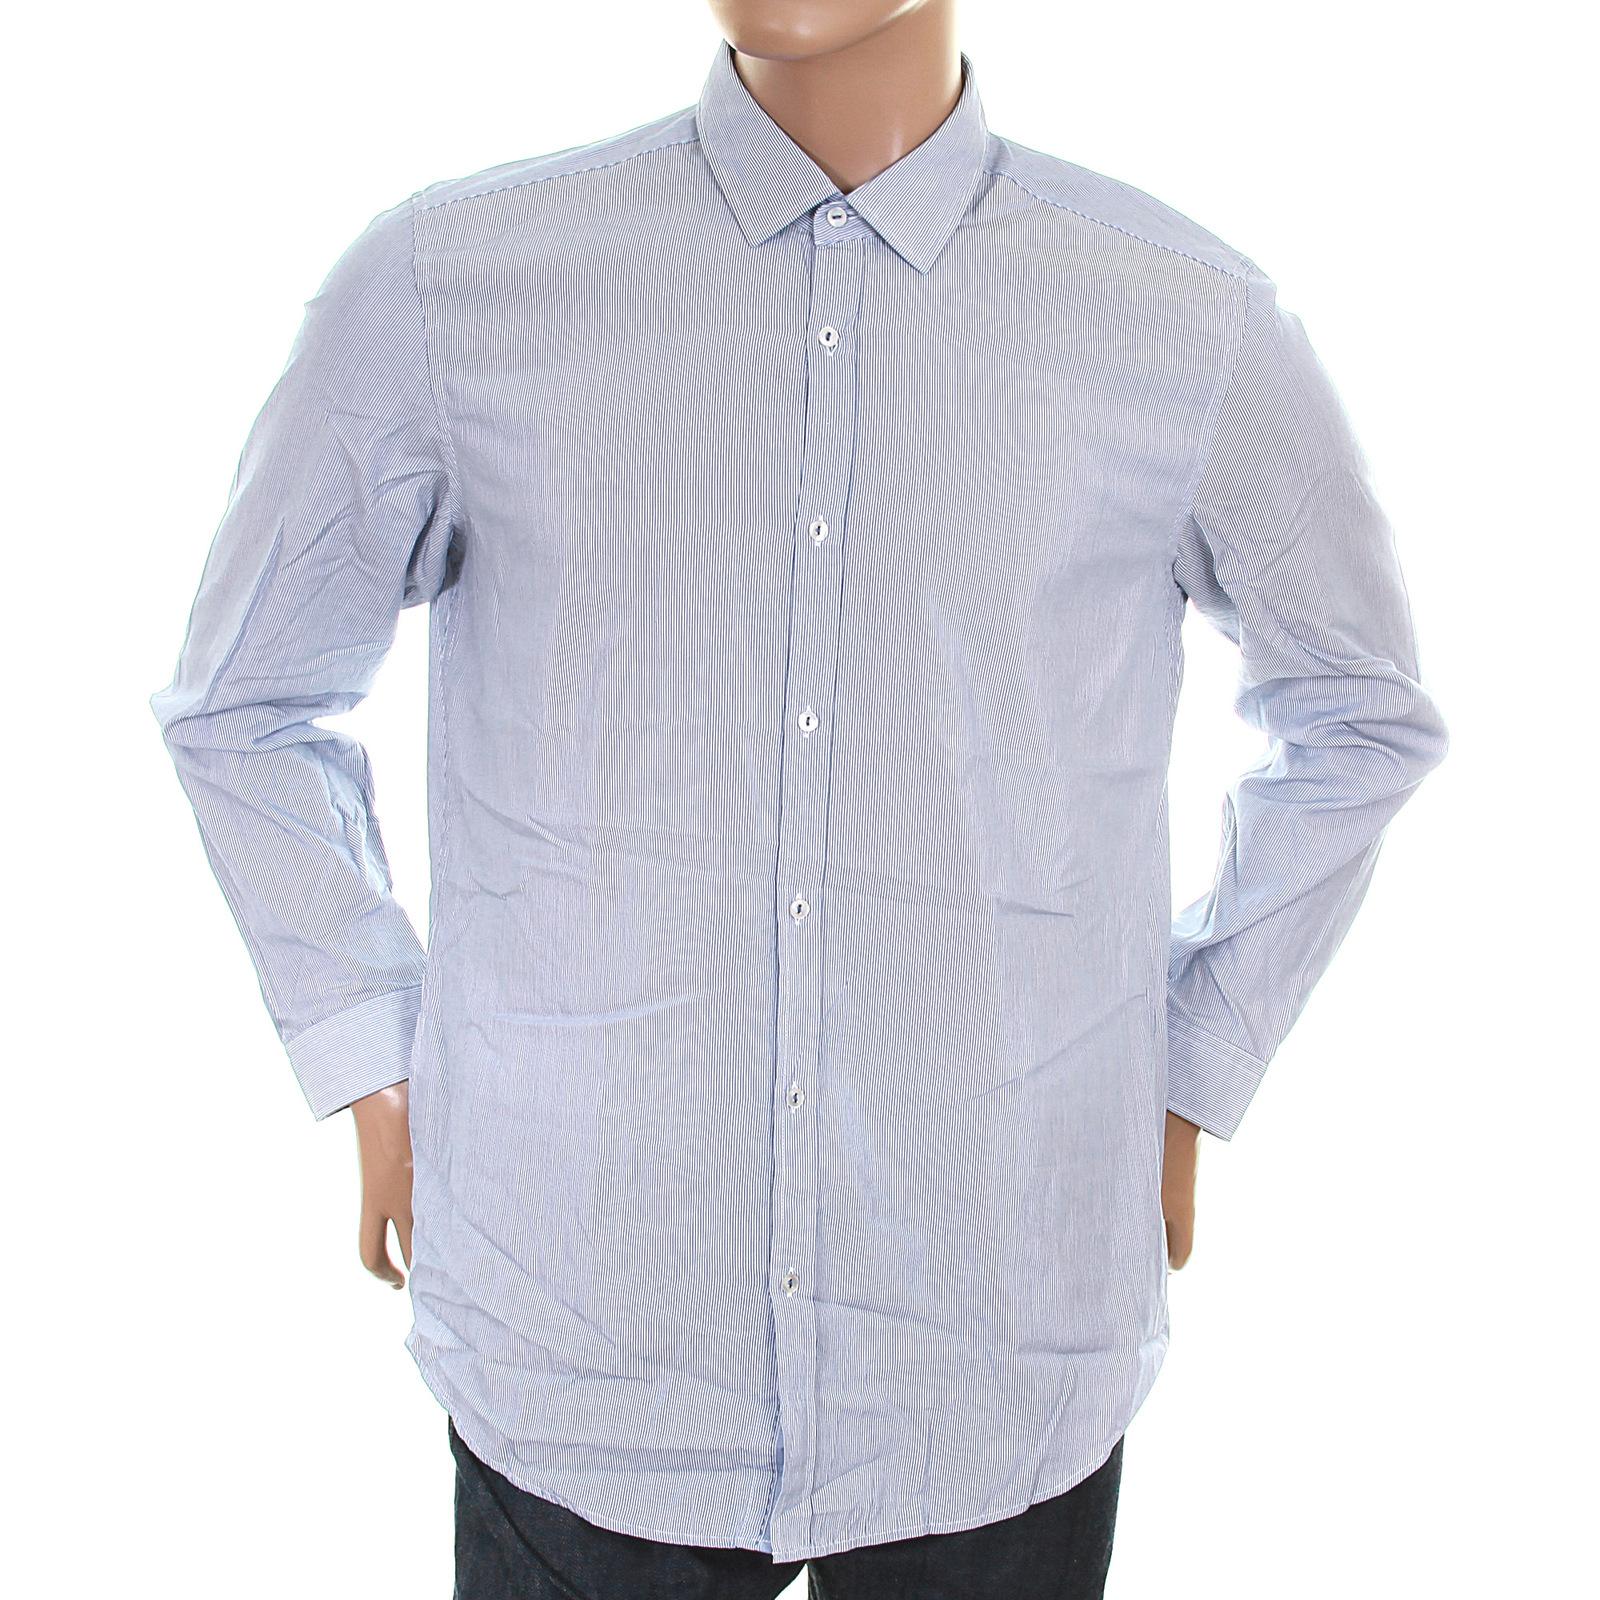 bcf574f6f Hugo Boss Black Label mens blue Lorenzo 50226367 striped shirt BOSS1472 at  Togged Clothing